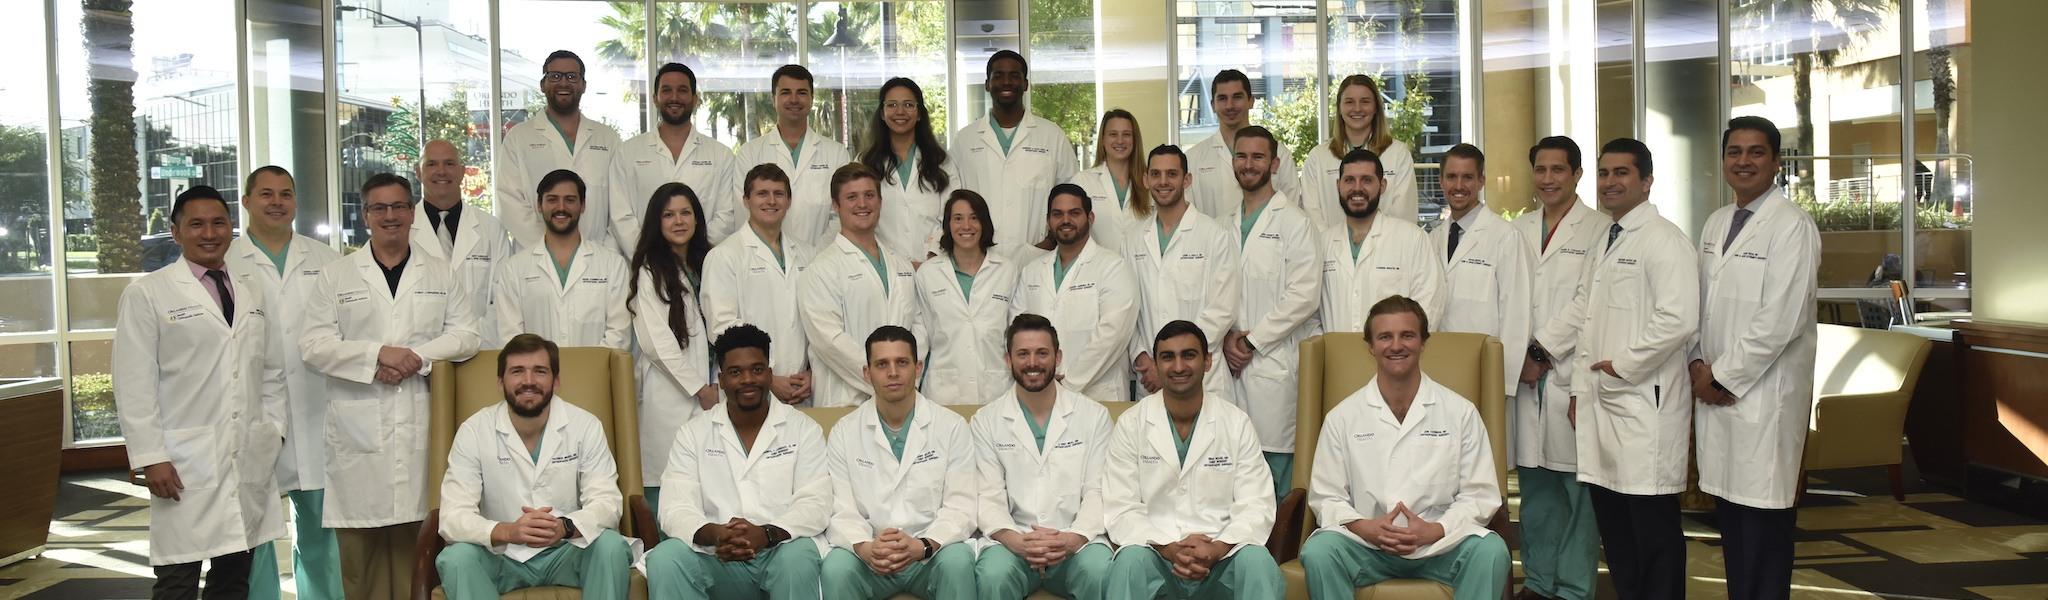 Orthopedic Resident Group 2020